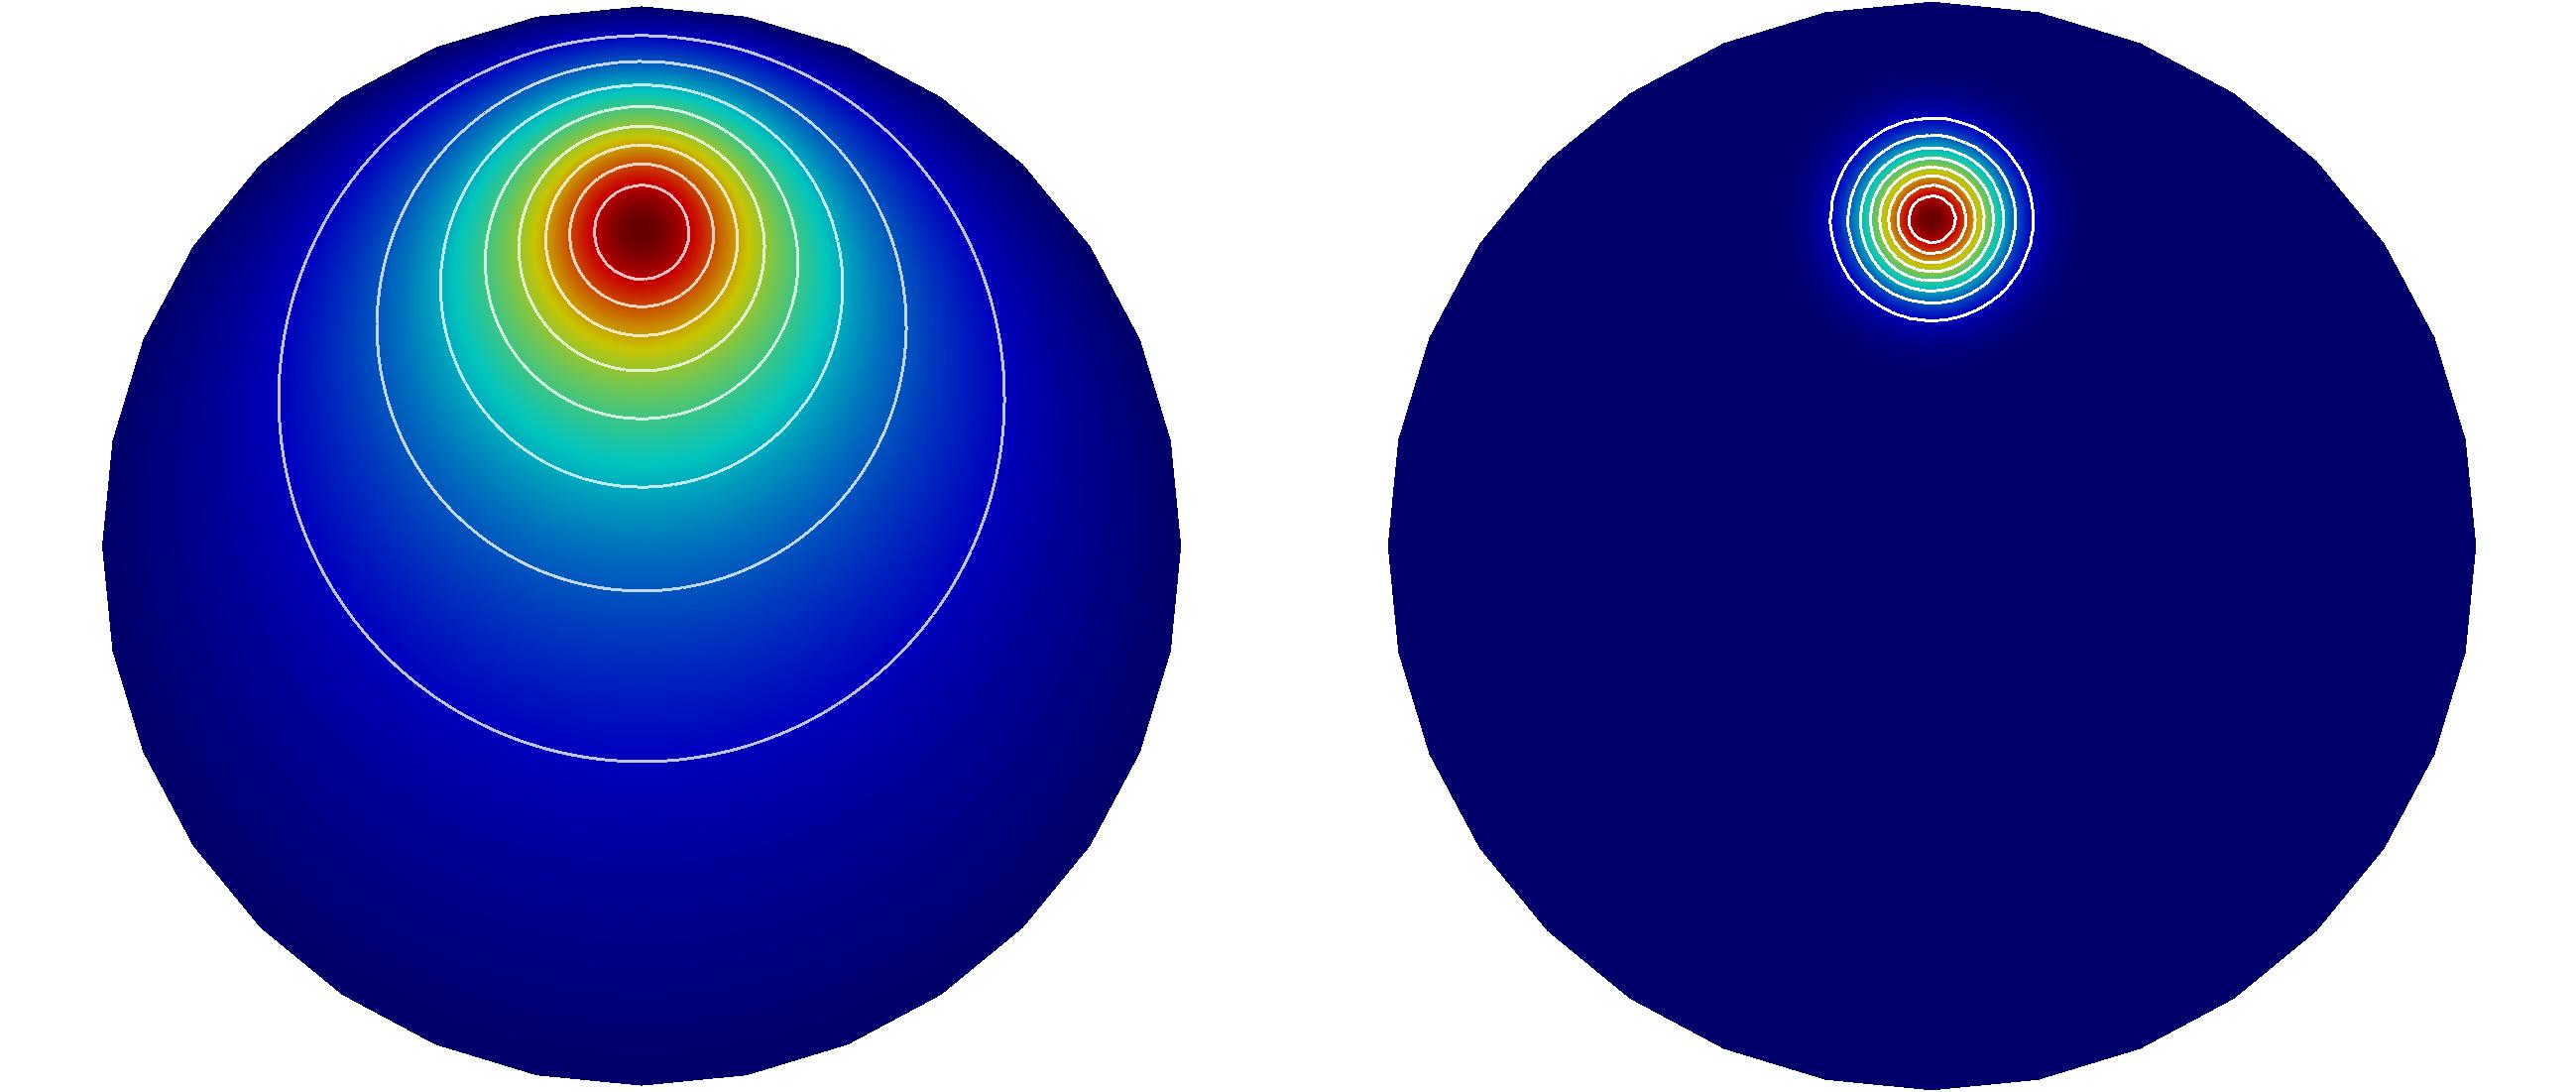 Fundamentals: Solving the Poisson equation